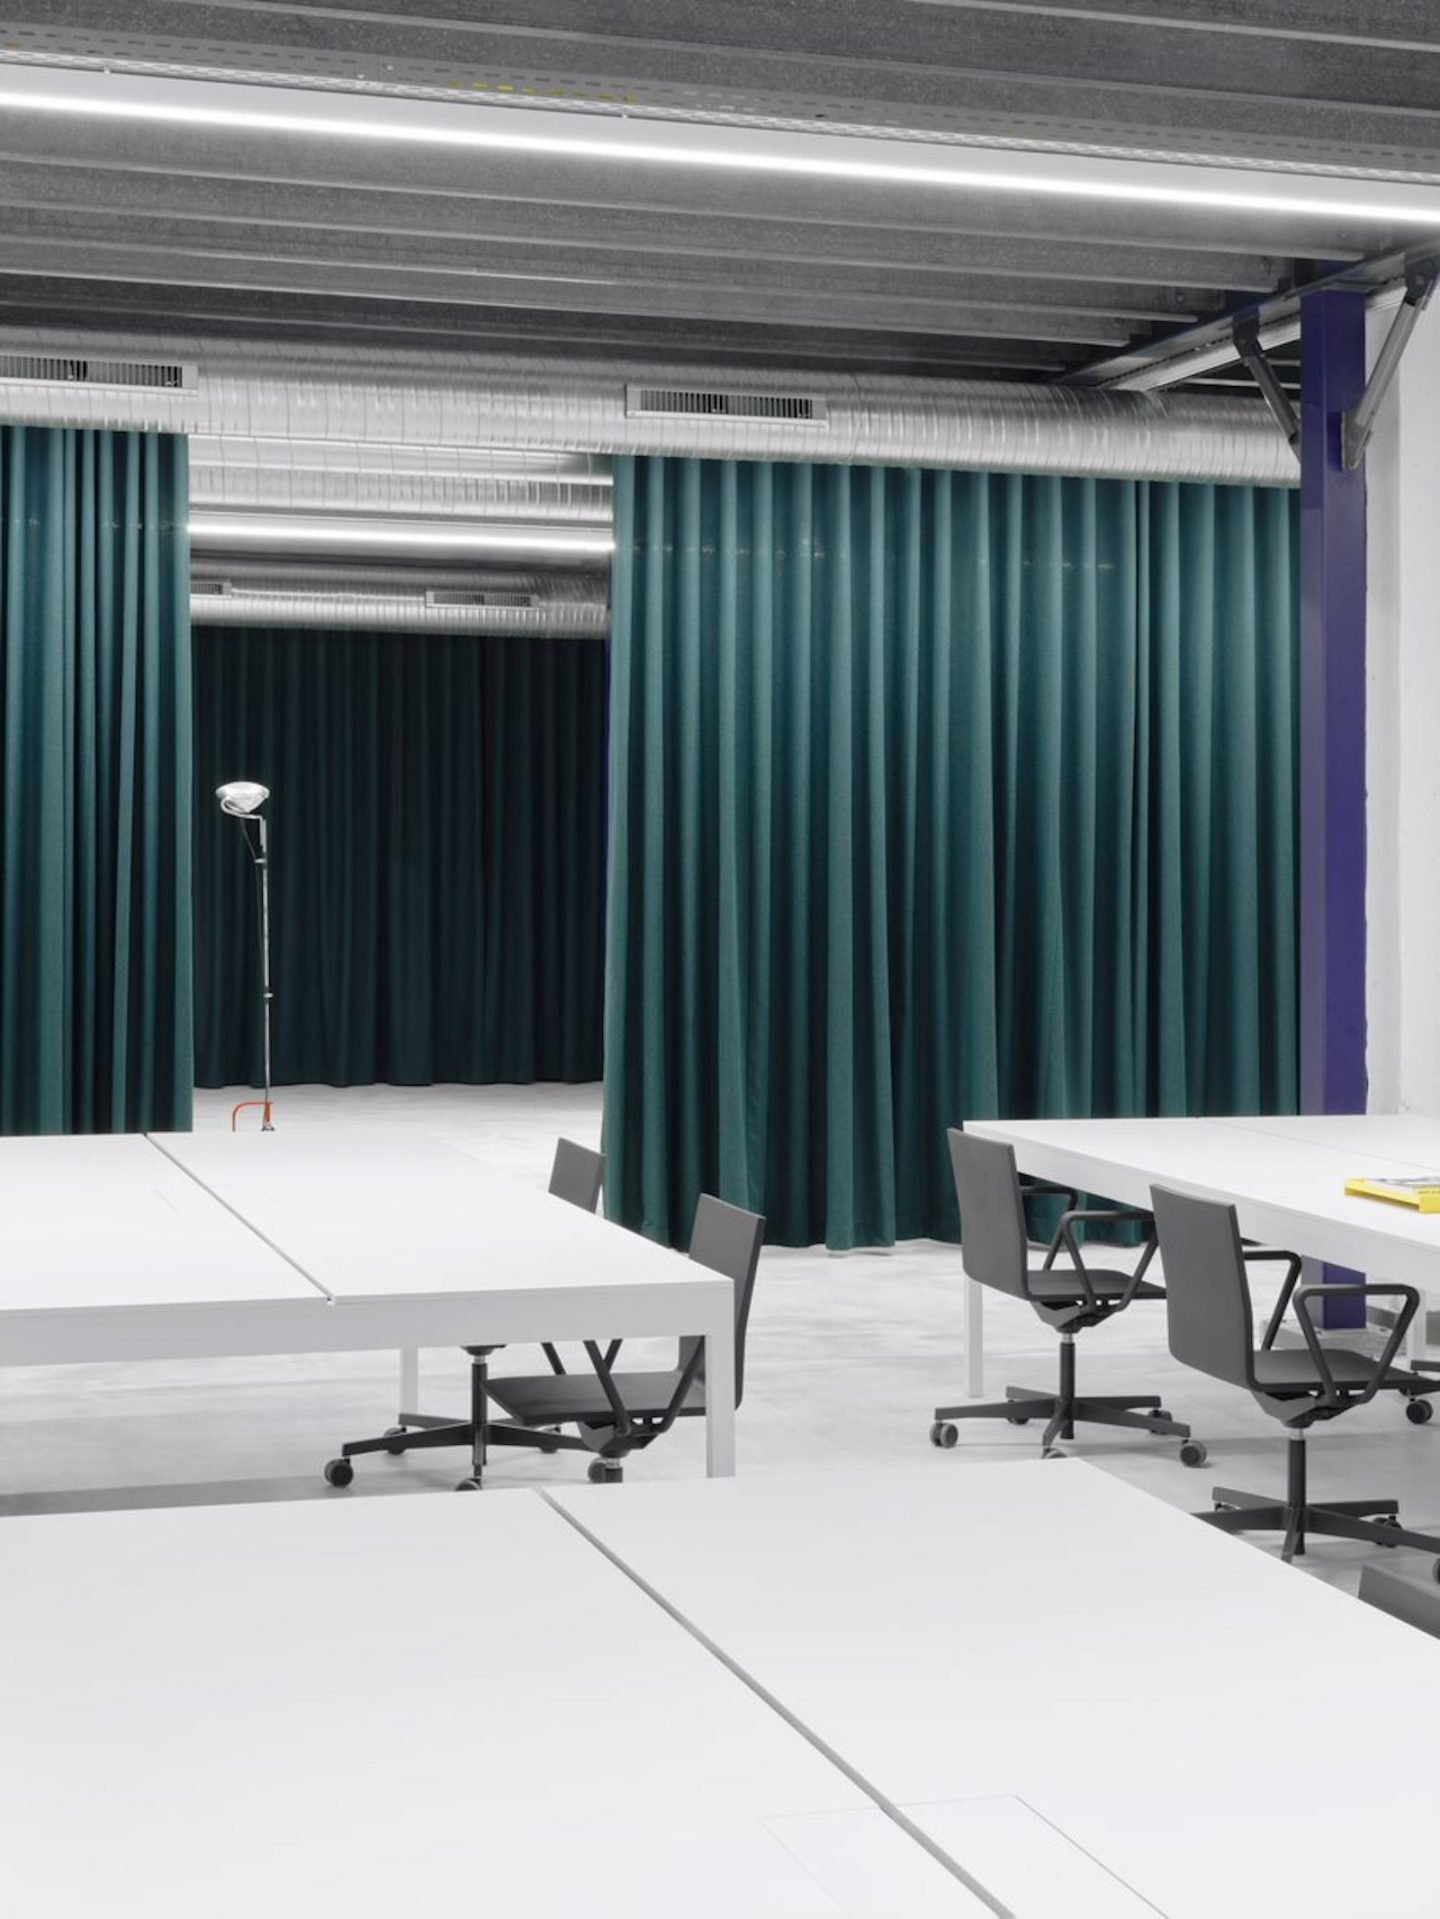 IGNANT-Design-KX-Workshop-Kemmler-07